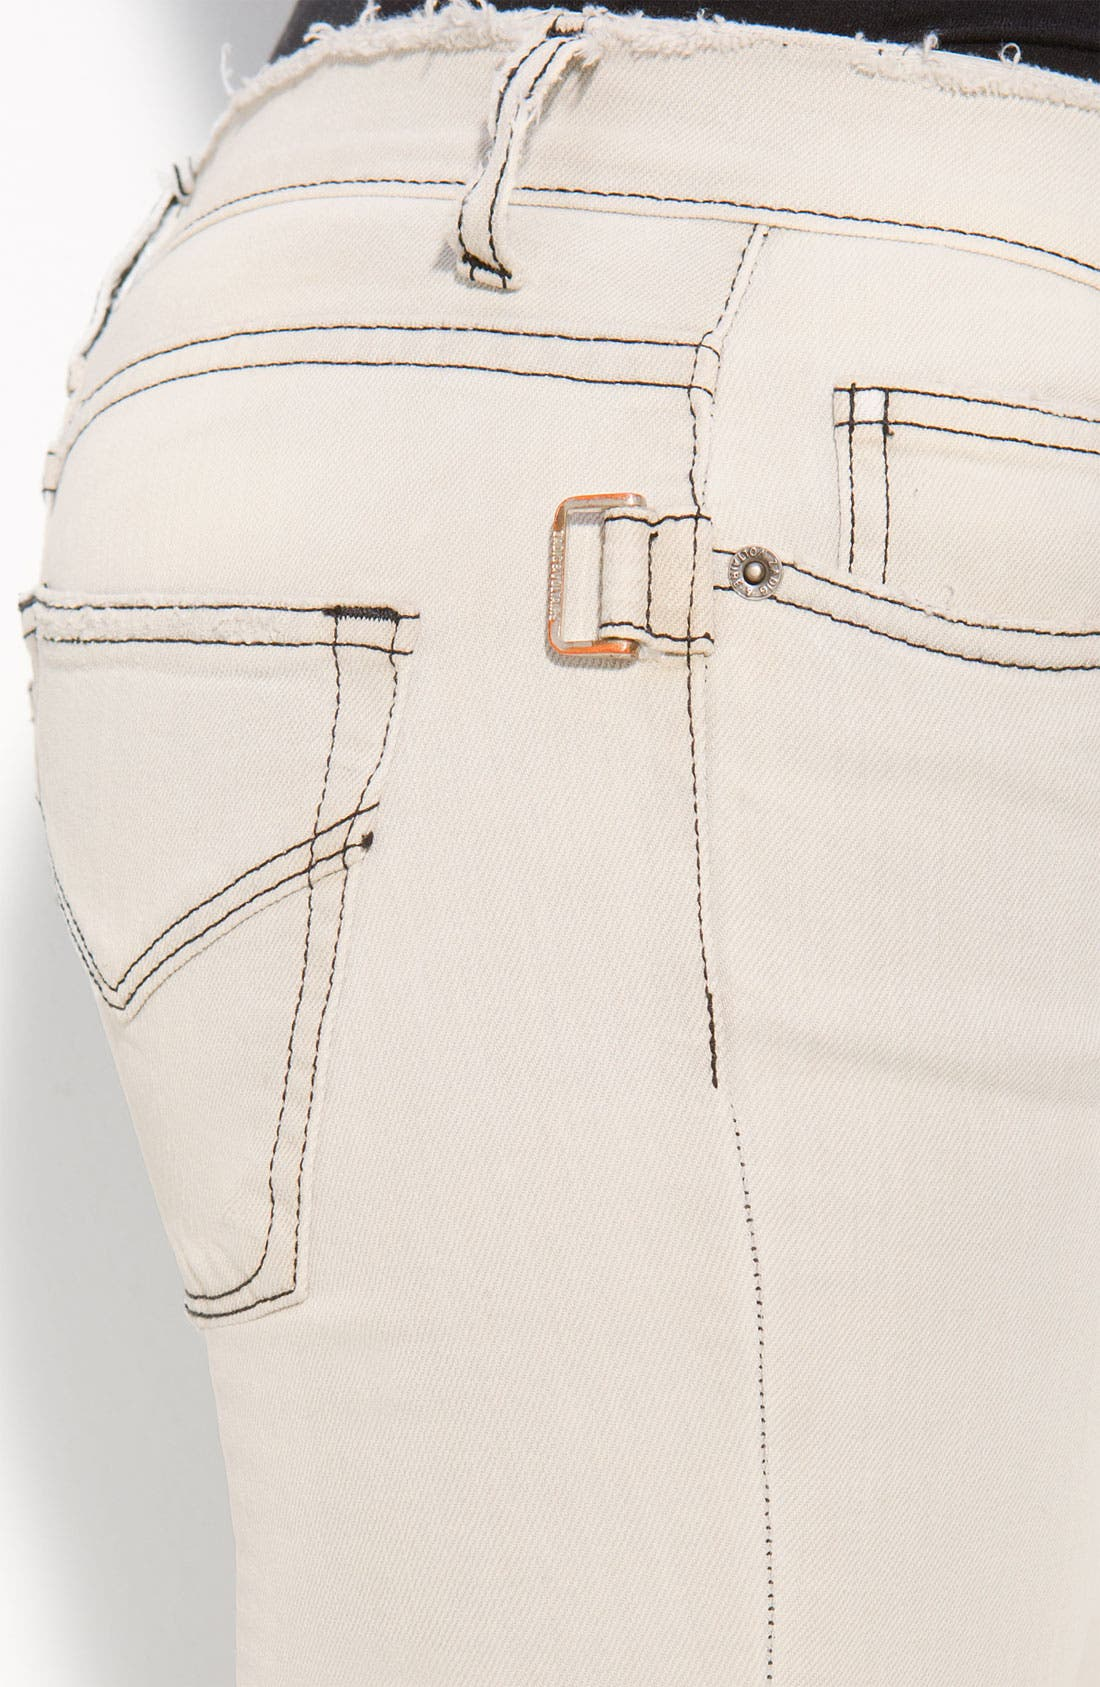 'Darkside' Bleached Skinny Jeans,                             Alternate thumbnail 4, color,                             Blanc